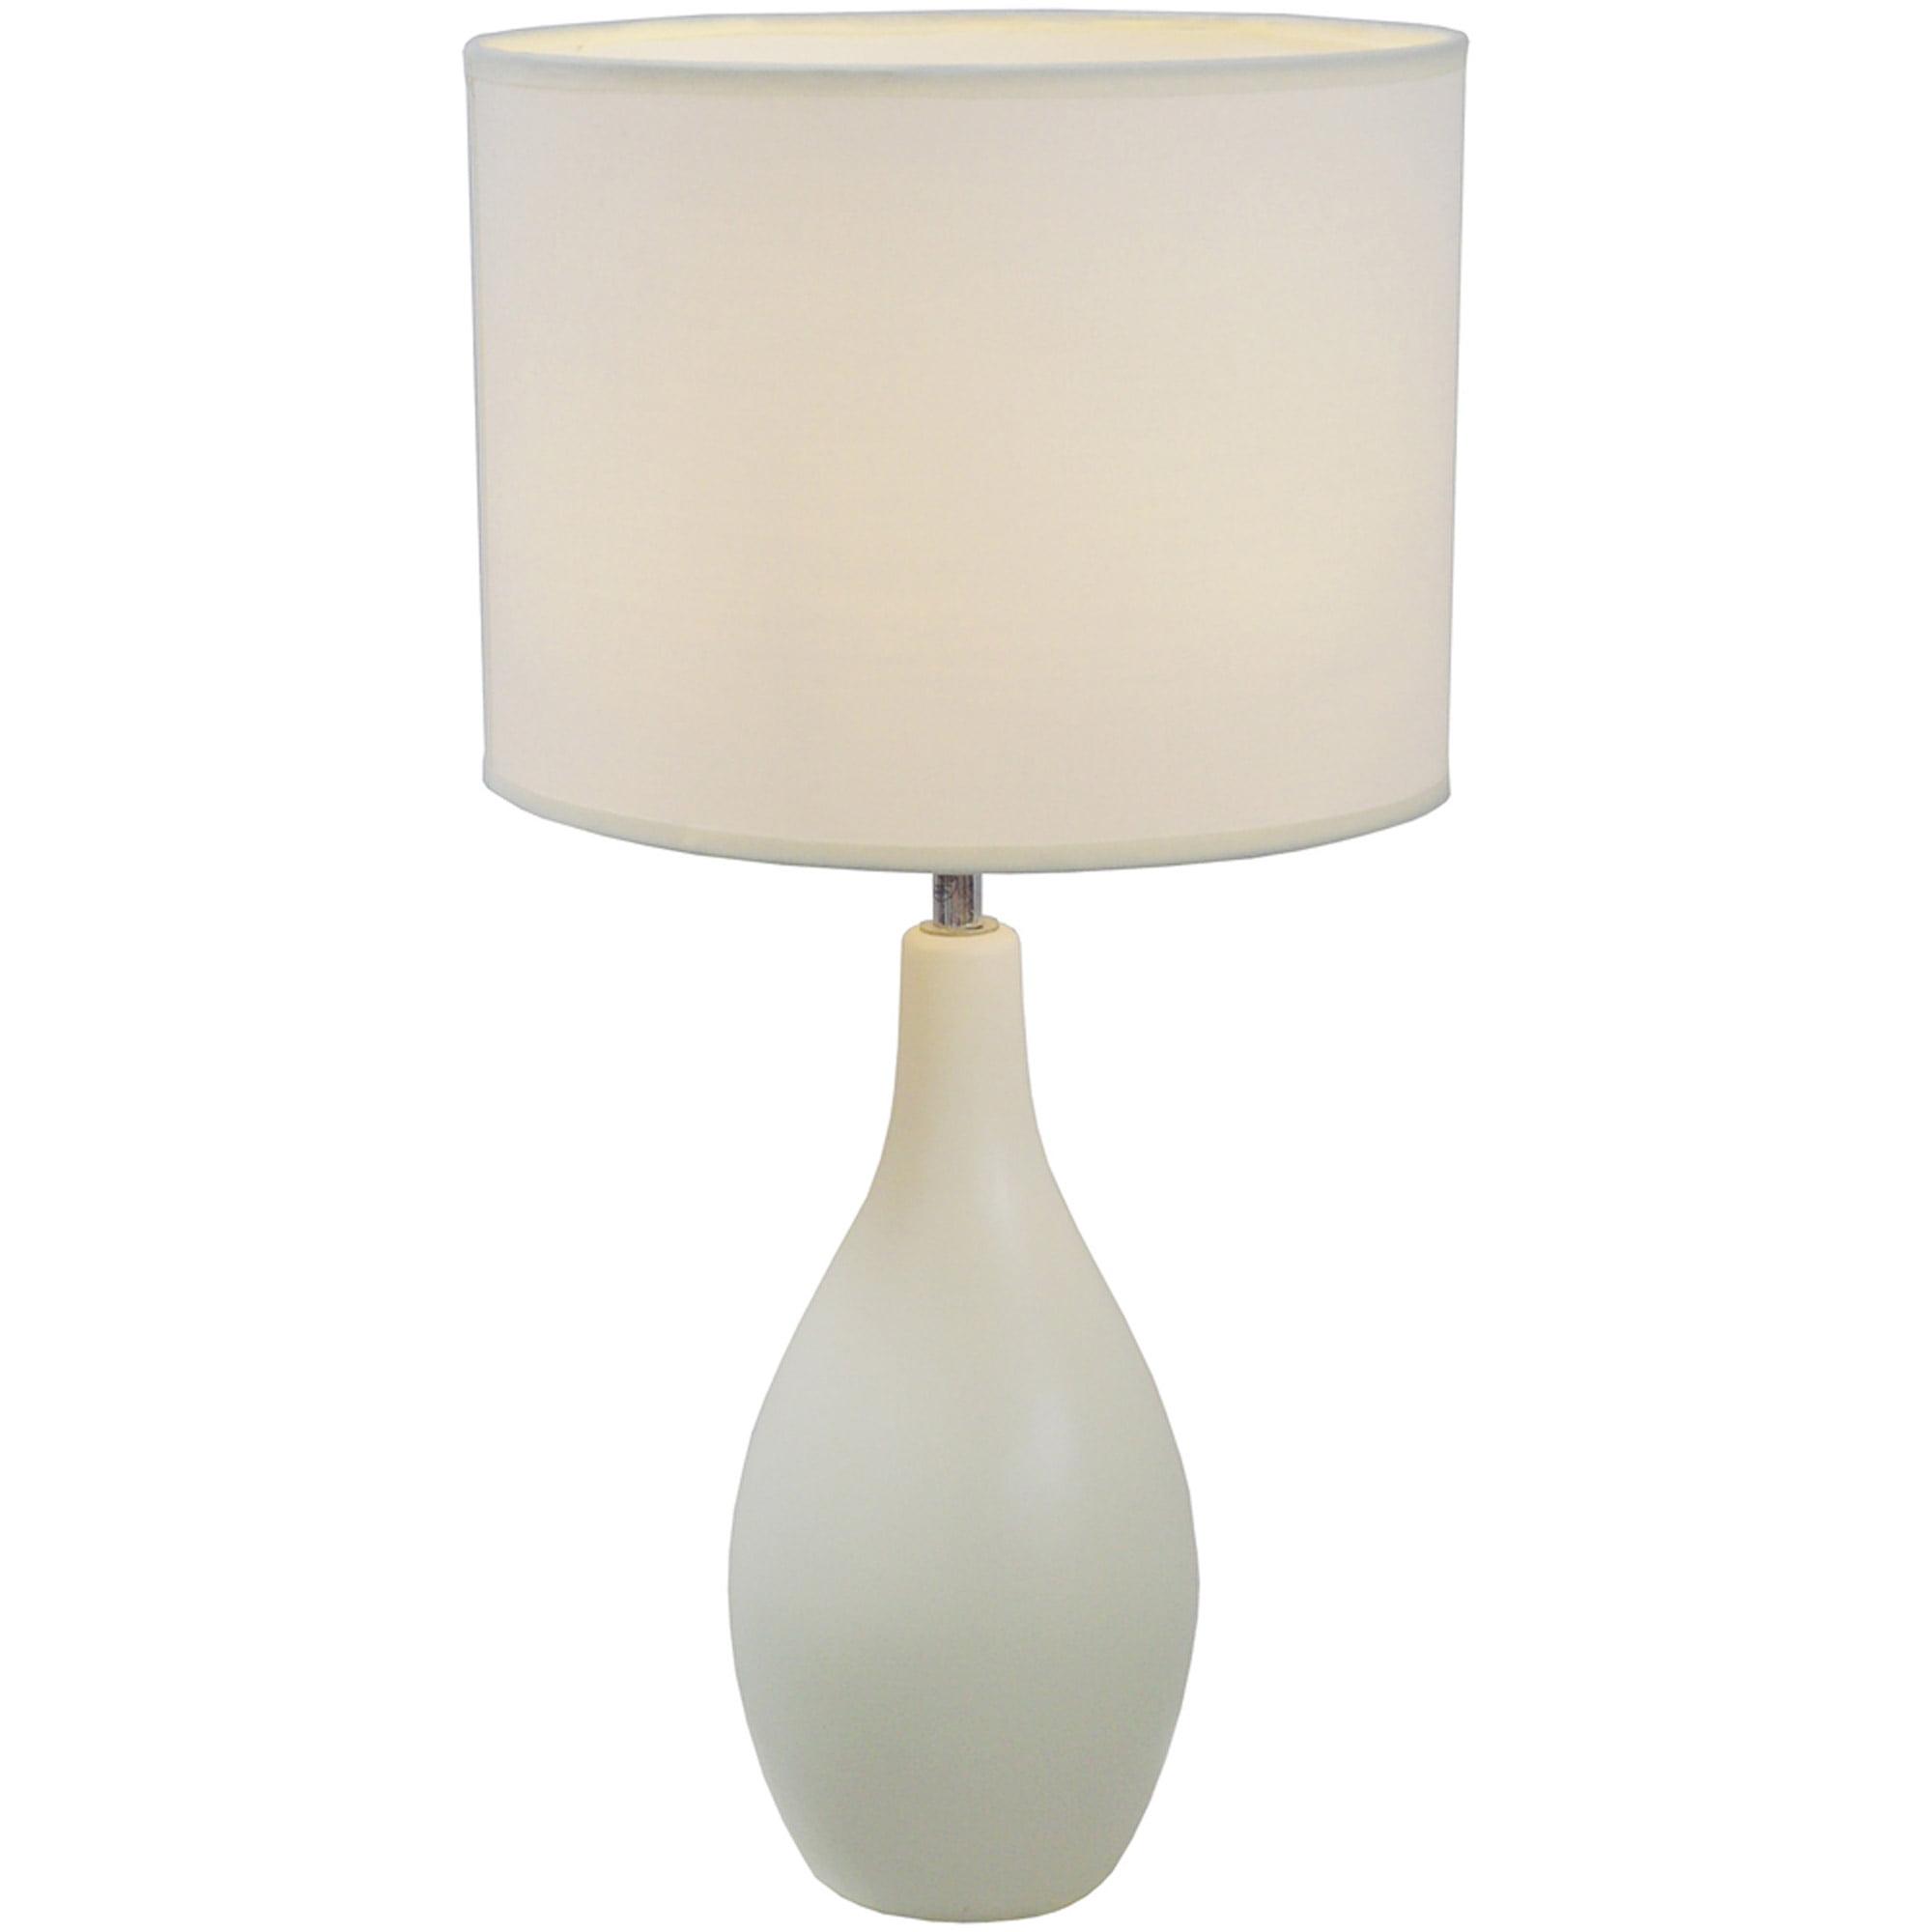 Novelty Lamp Base : Oriental Furniture Himalayan Salt Pyramid 7 H Table Lamp with Novelty Shade - Walmart.com